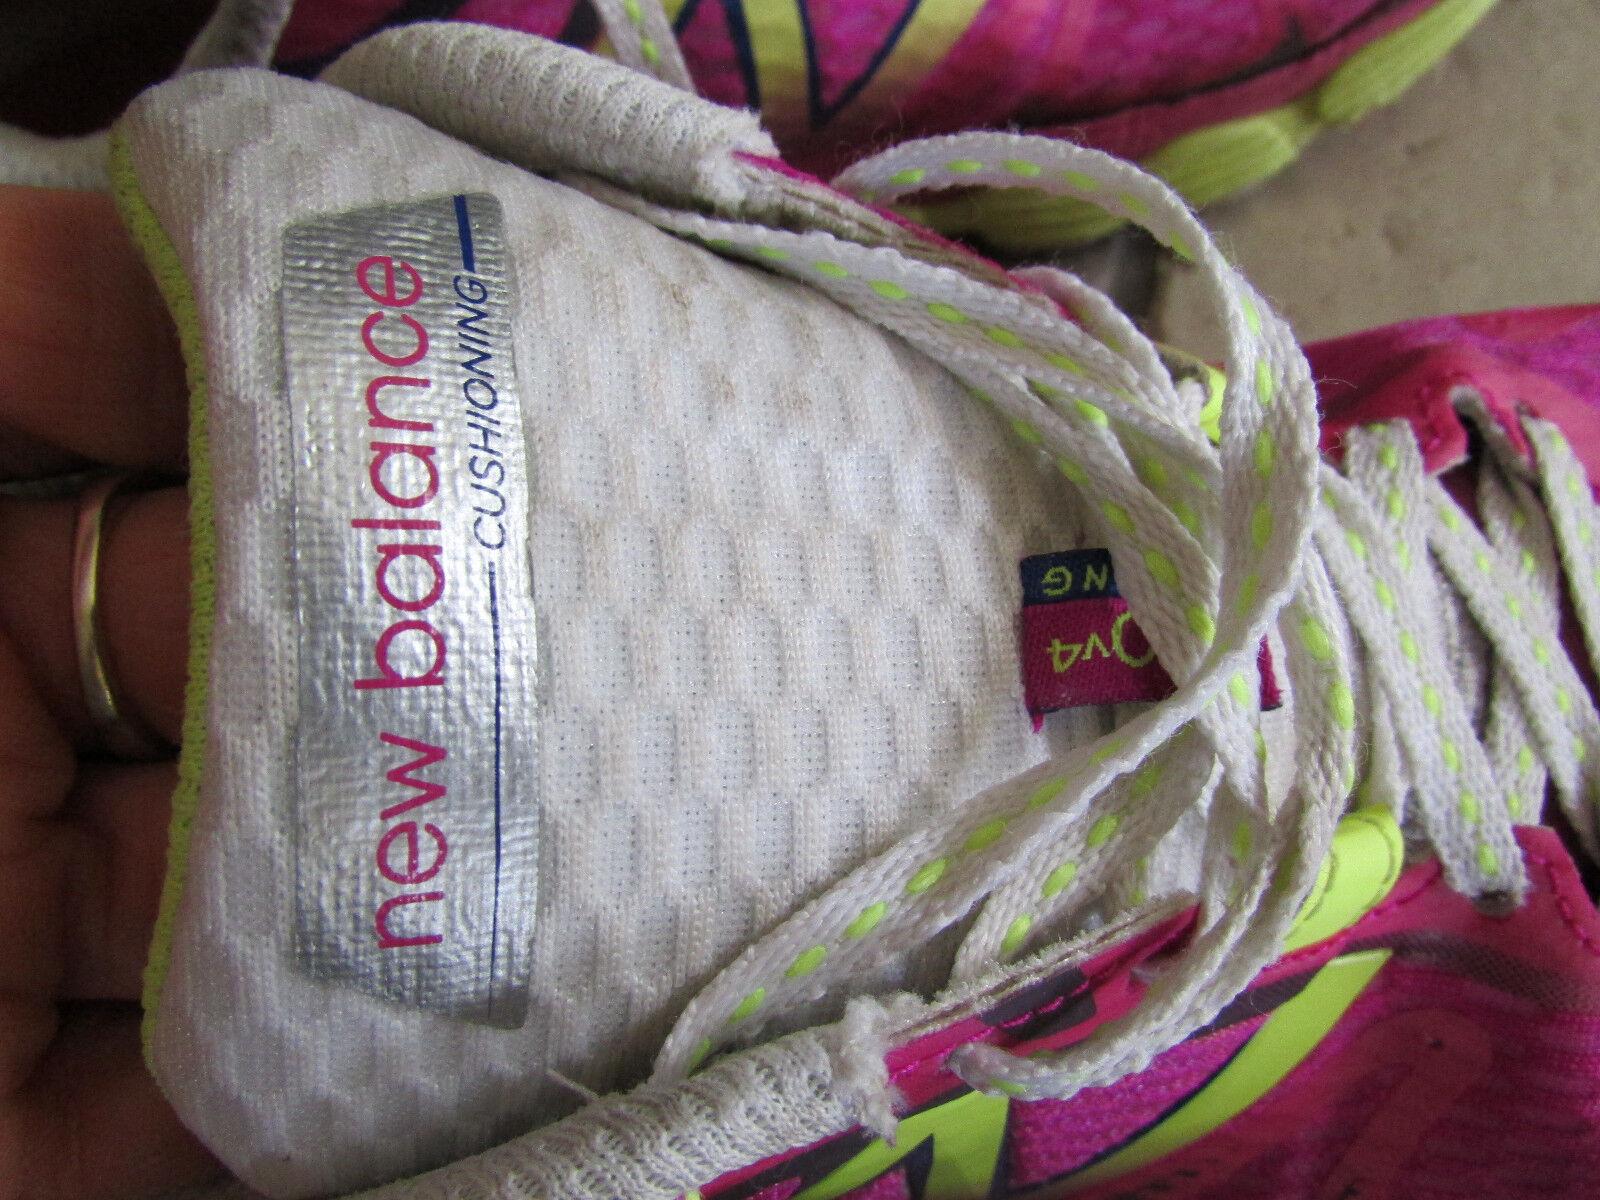 buy online 2949f 599f2 ... NIKE FREE RUN RUN RUN 2 RUNNING SHOES WOMENS 7.5 STYLE  443816 2011 FREE  SHIP ...